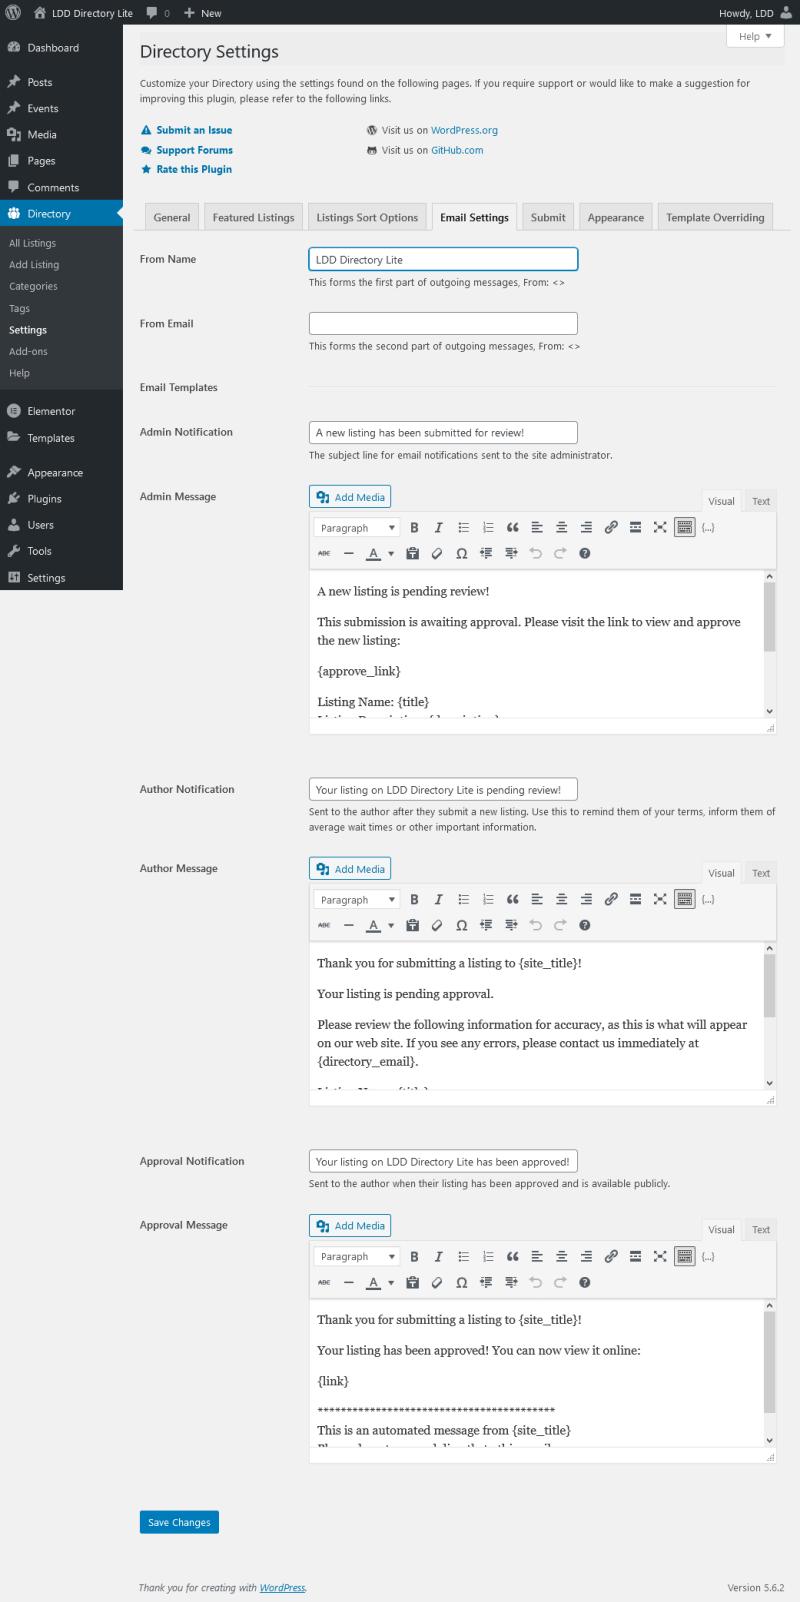 LDD Directory Lite - Email Settings